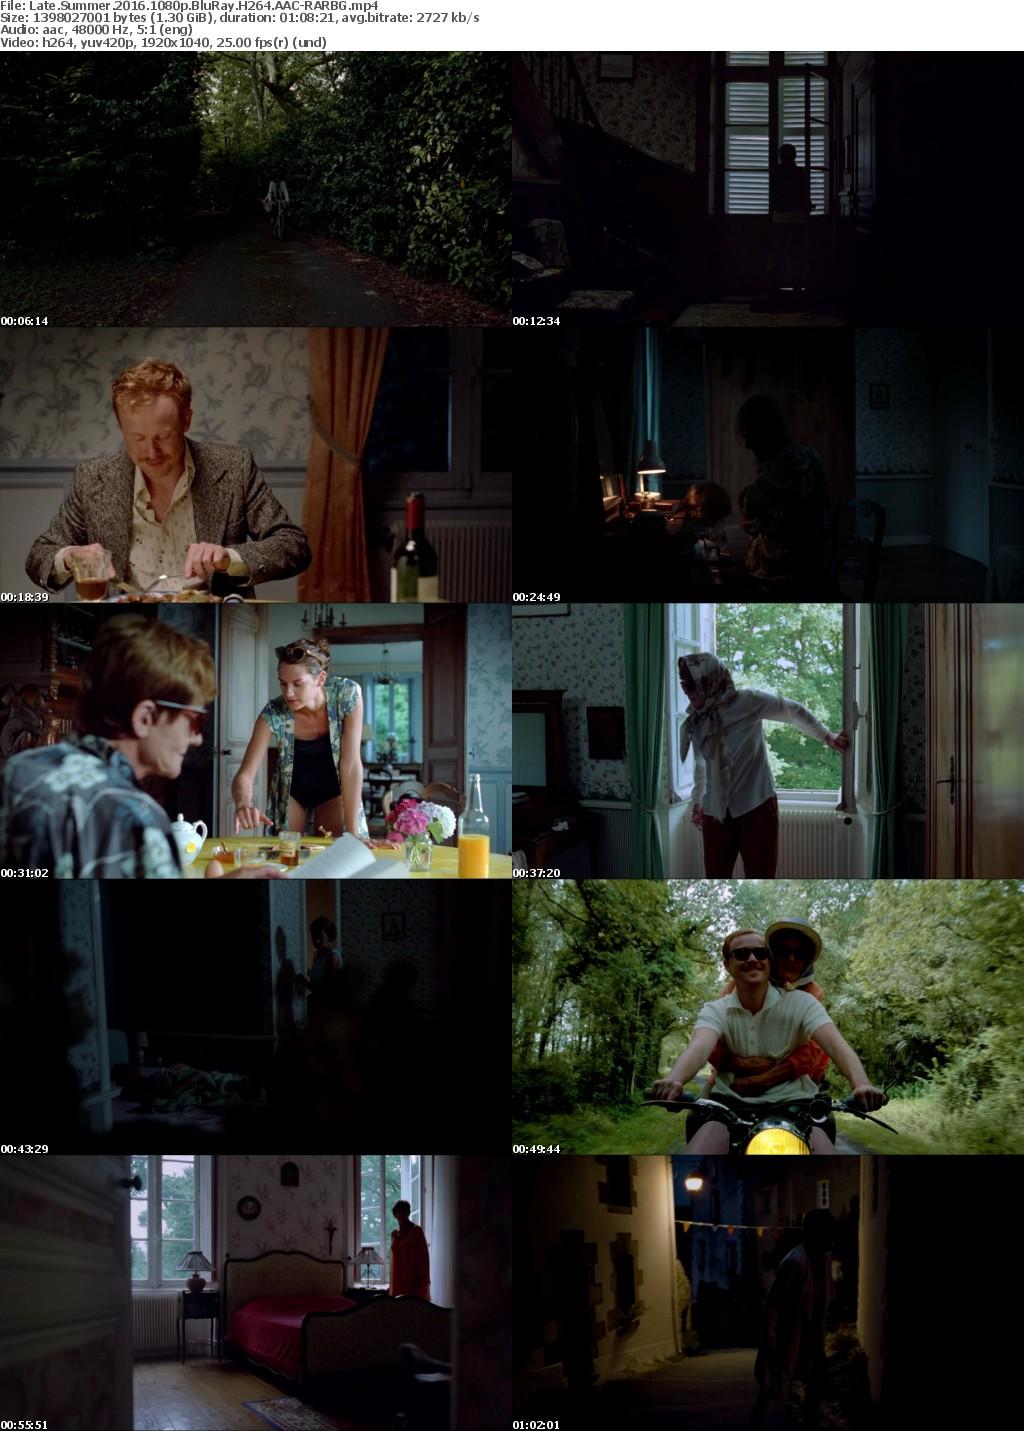 Late Summer (2016) 1080p BluRay H264 AAC-RARBG